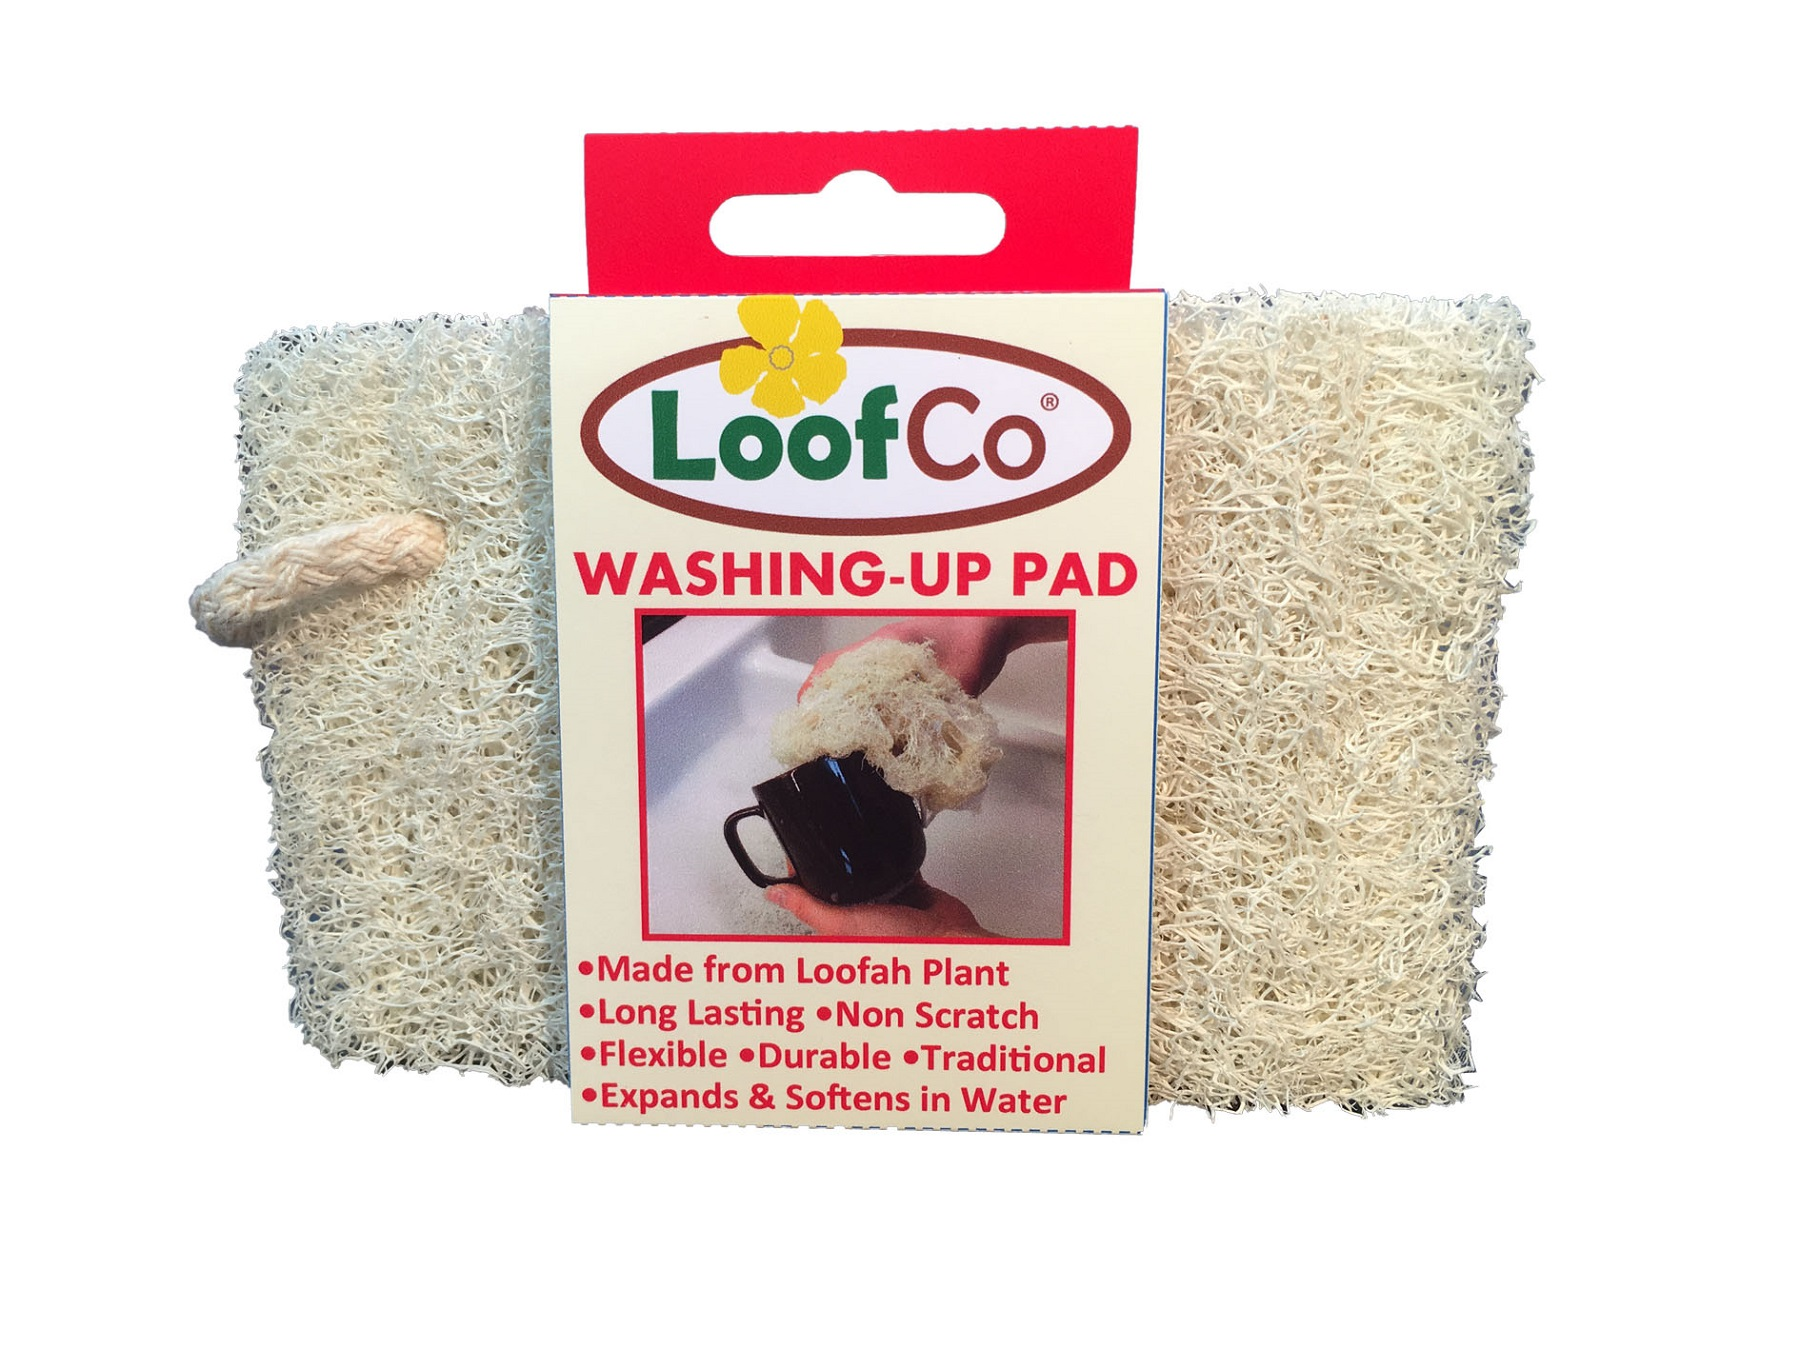 Afwas spons Loofco